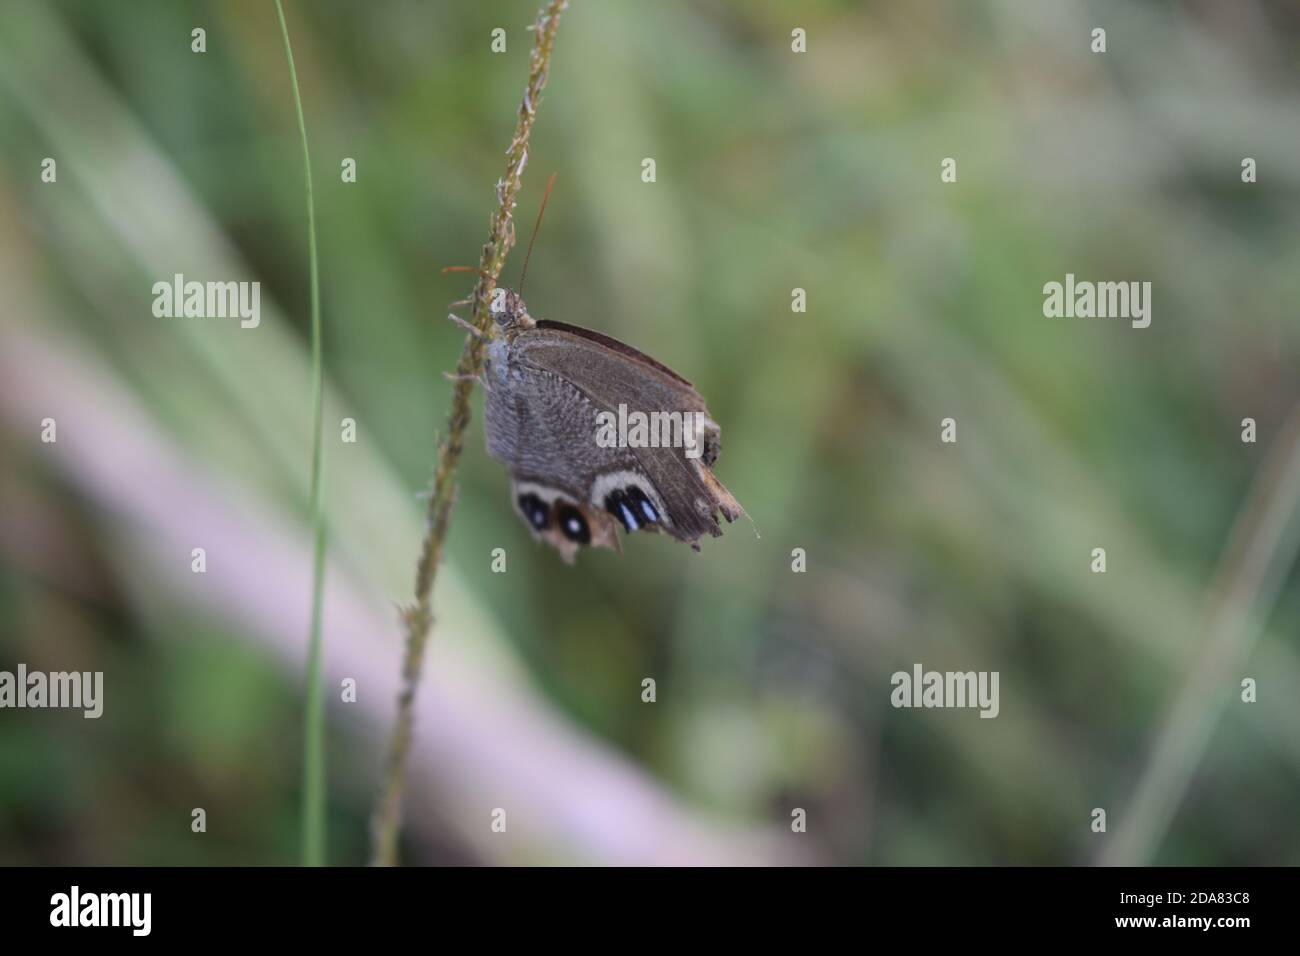 Vale la pena ver la mariposa gris jugando Foto de stock